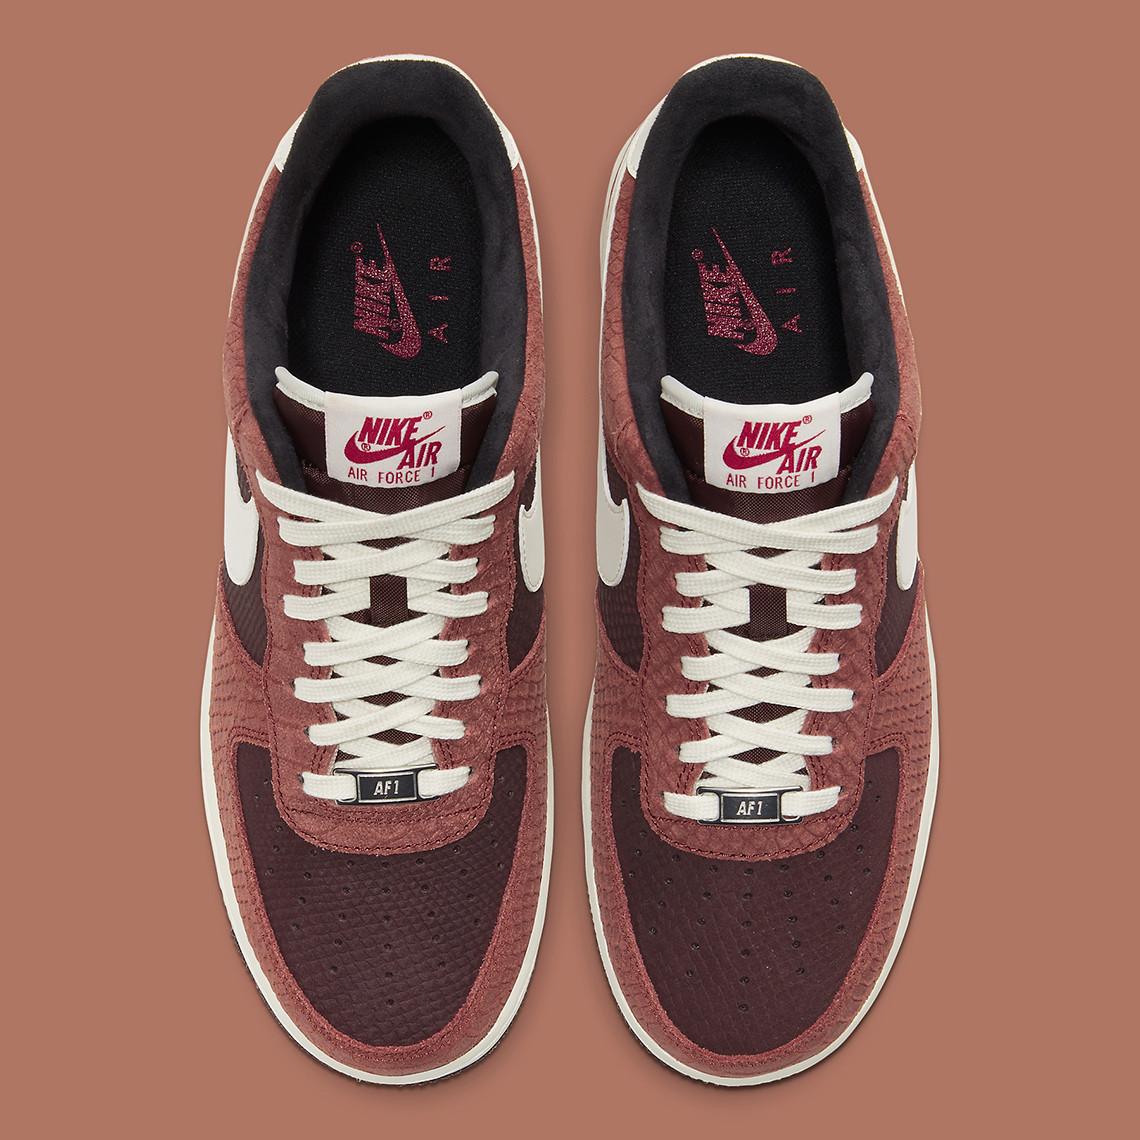 Nike Air Force 1 PRM ''Red Bark'' - CV5567-200